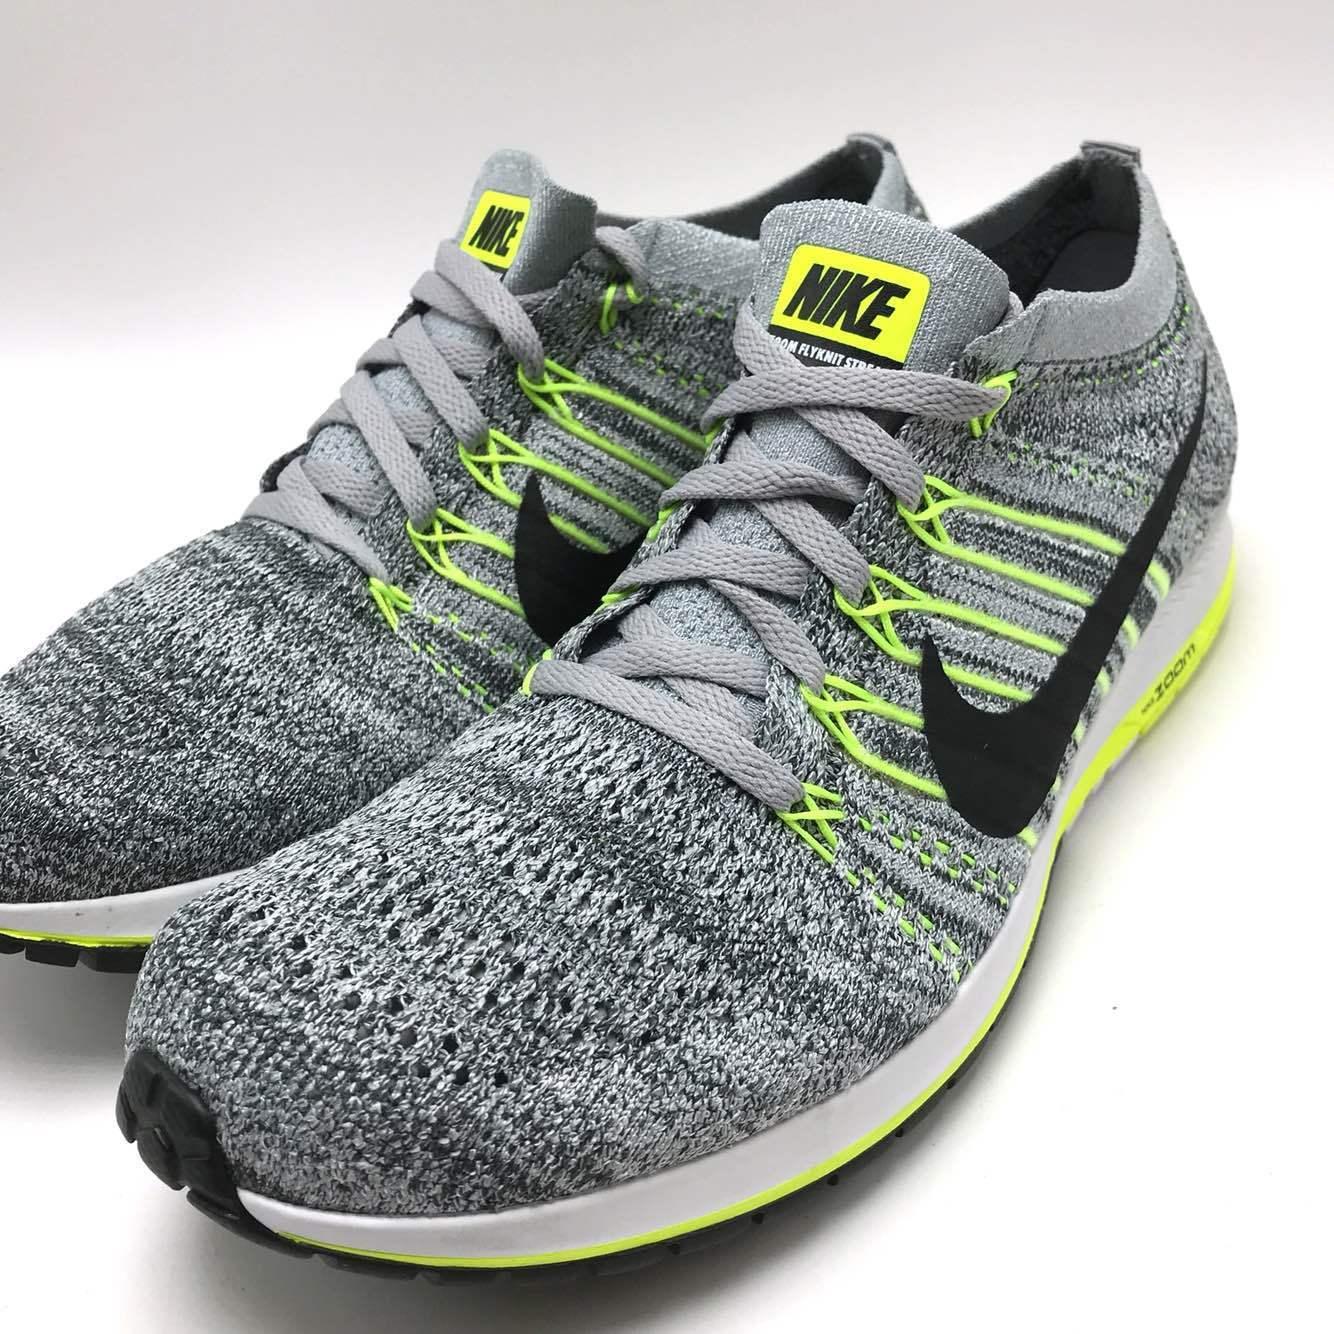 Casual wild Nike Flyknit Streak Men's Running Shoes Wolf Grey/Black-Anthracite 835994-007